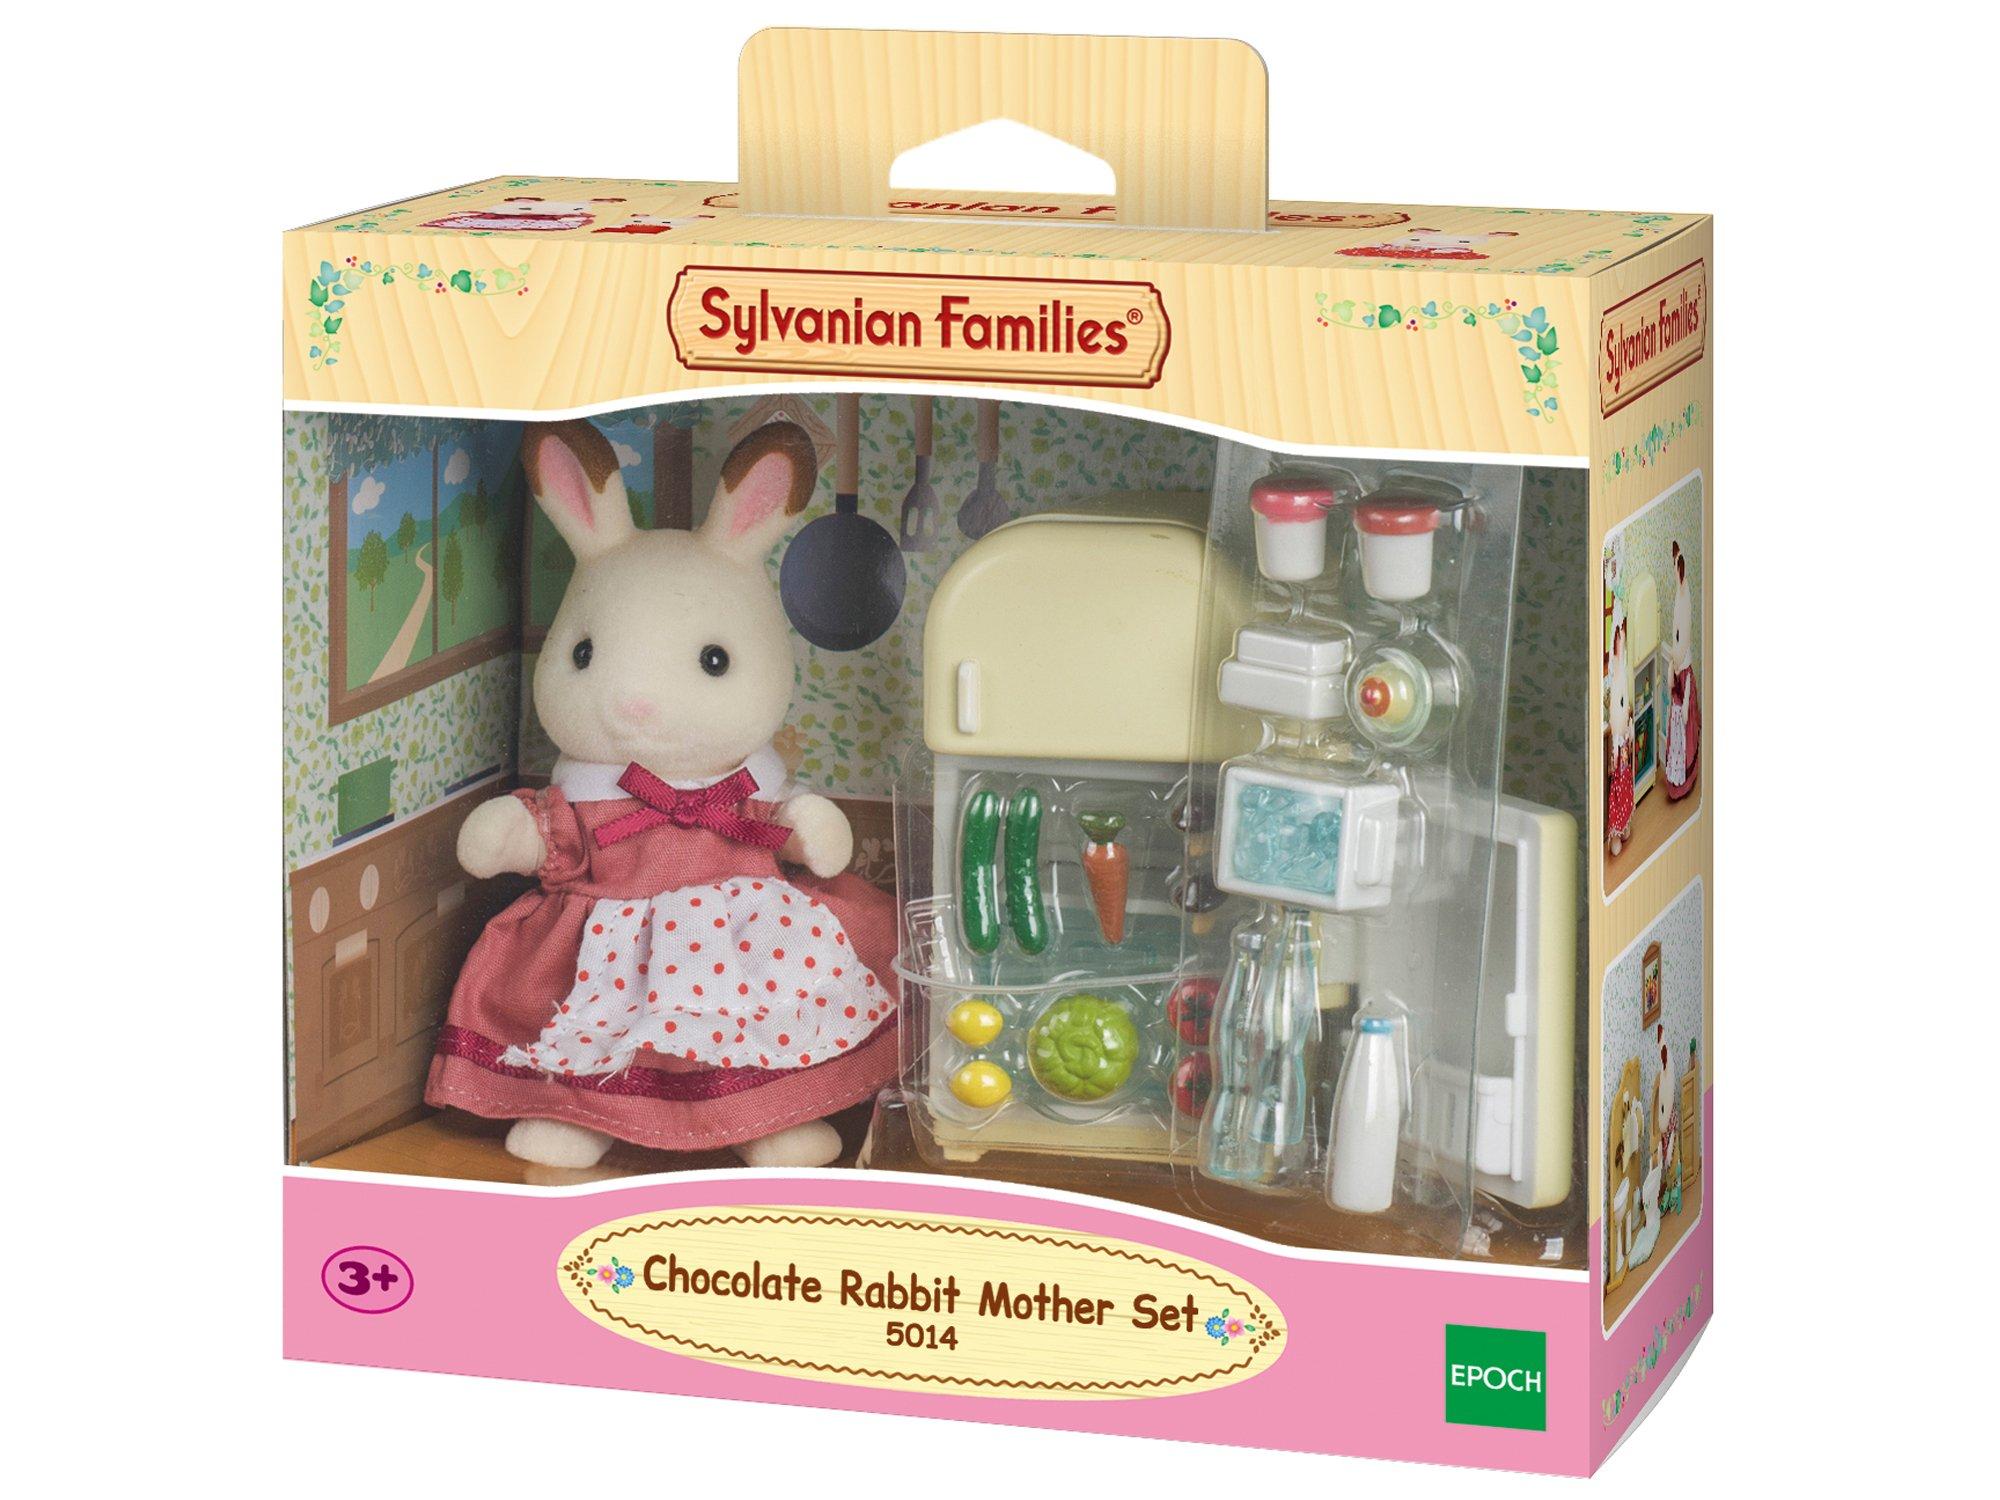 Sylvanian Families Rabbit Mother Set Maman Lapin Chocolat/Réfrigérateur, 5014, Multicolore product image